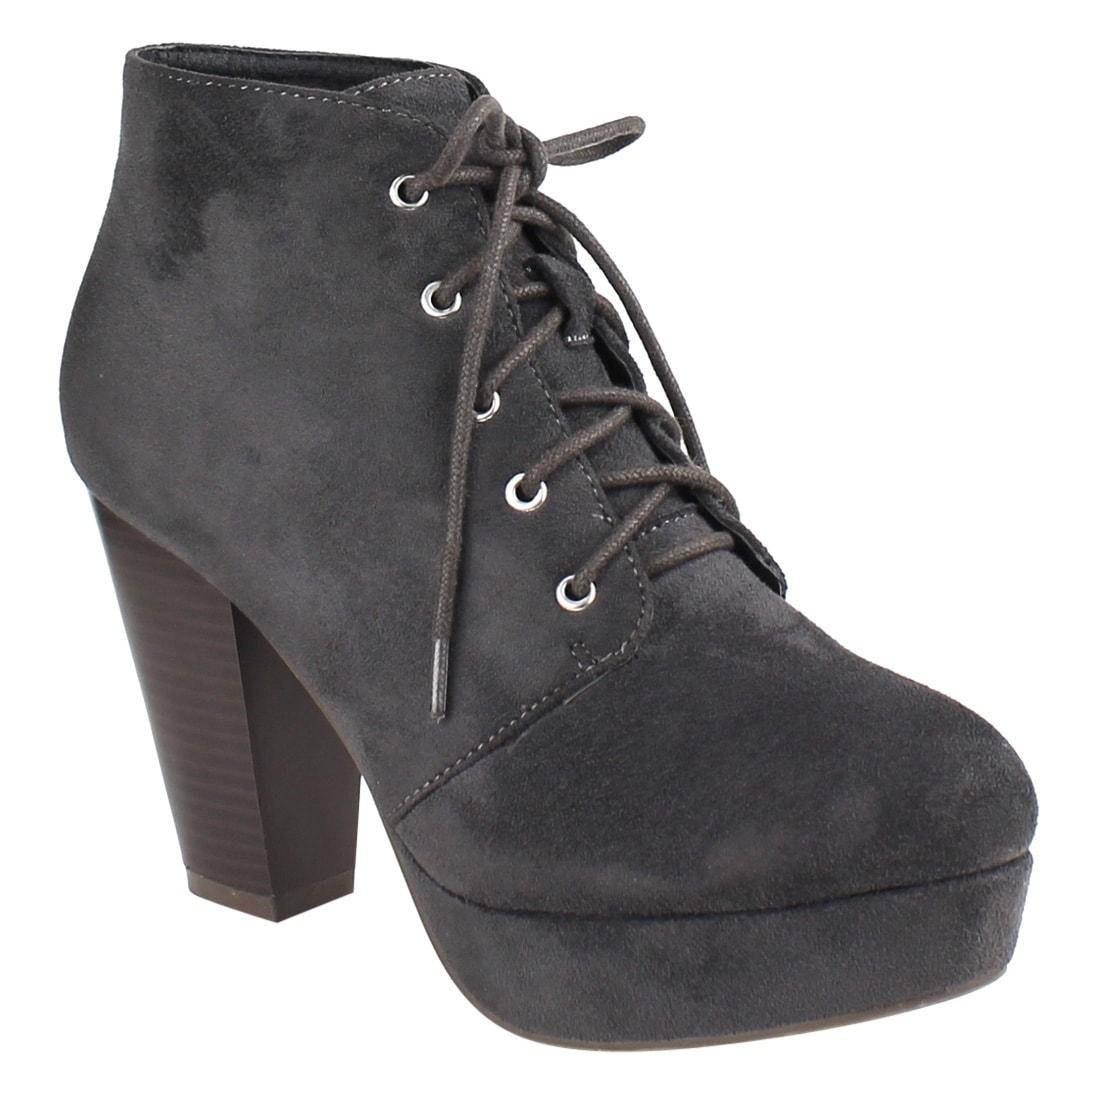 super popular 630d1 aed22 Beston-EI44-Womens-Lace-Up-Stacked-Chunky-Heel-Platform-Ankle-Bootie-879490fa-c194-49cf-b8bc-fa5f2b4adfa9.jpg